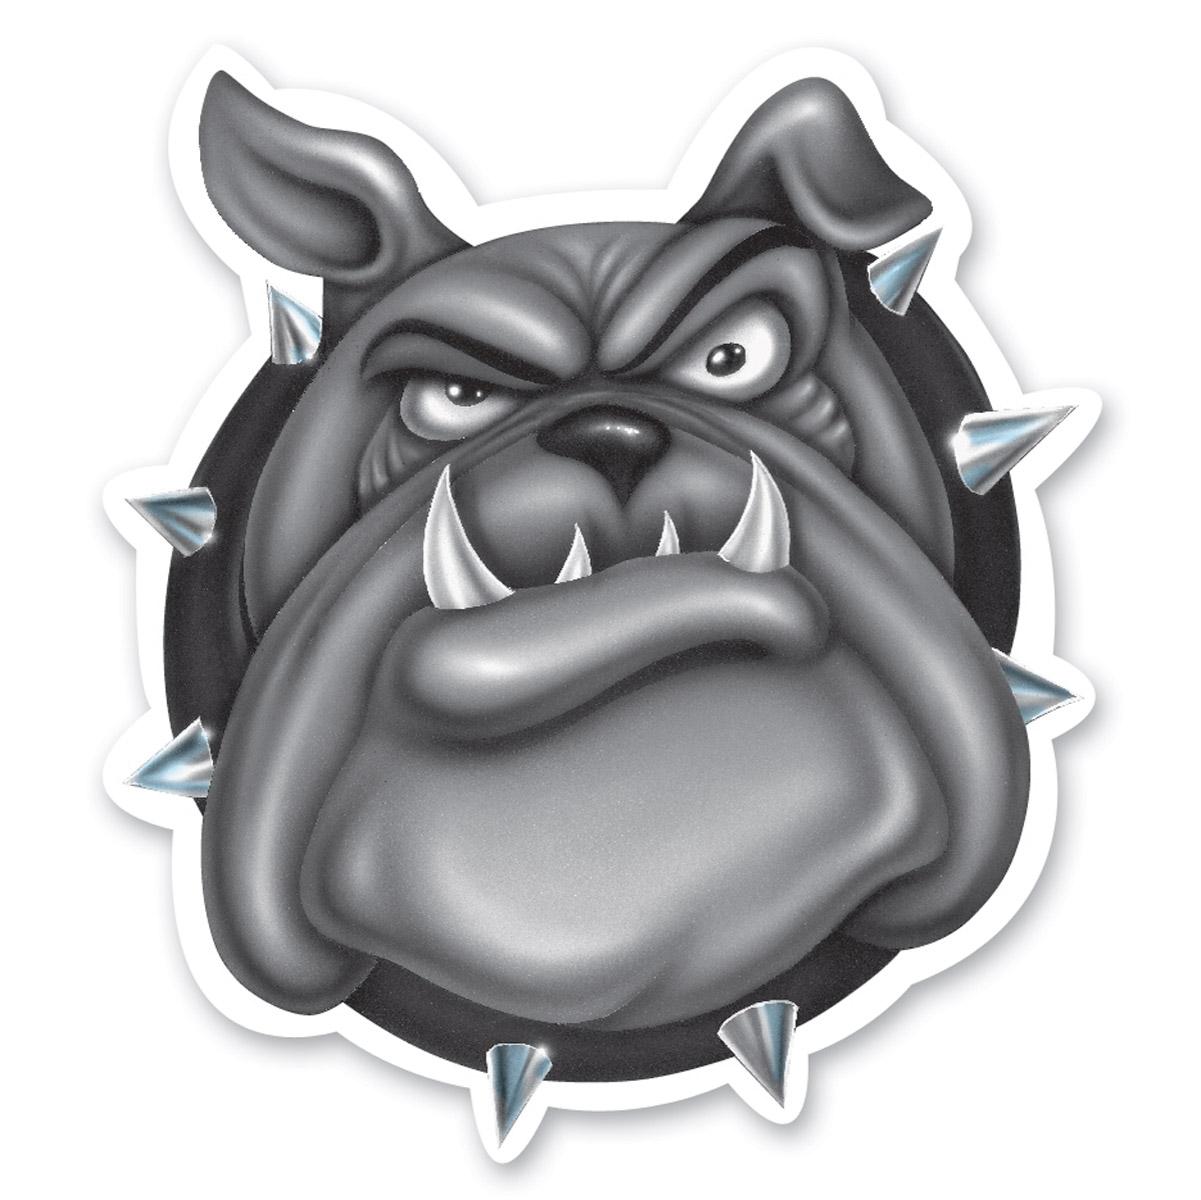 Lethal Threat Rude & Crude Bulldog Airbrushed Mini Decal